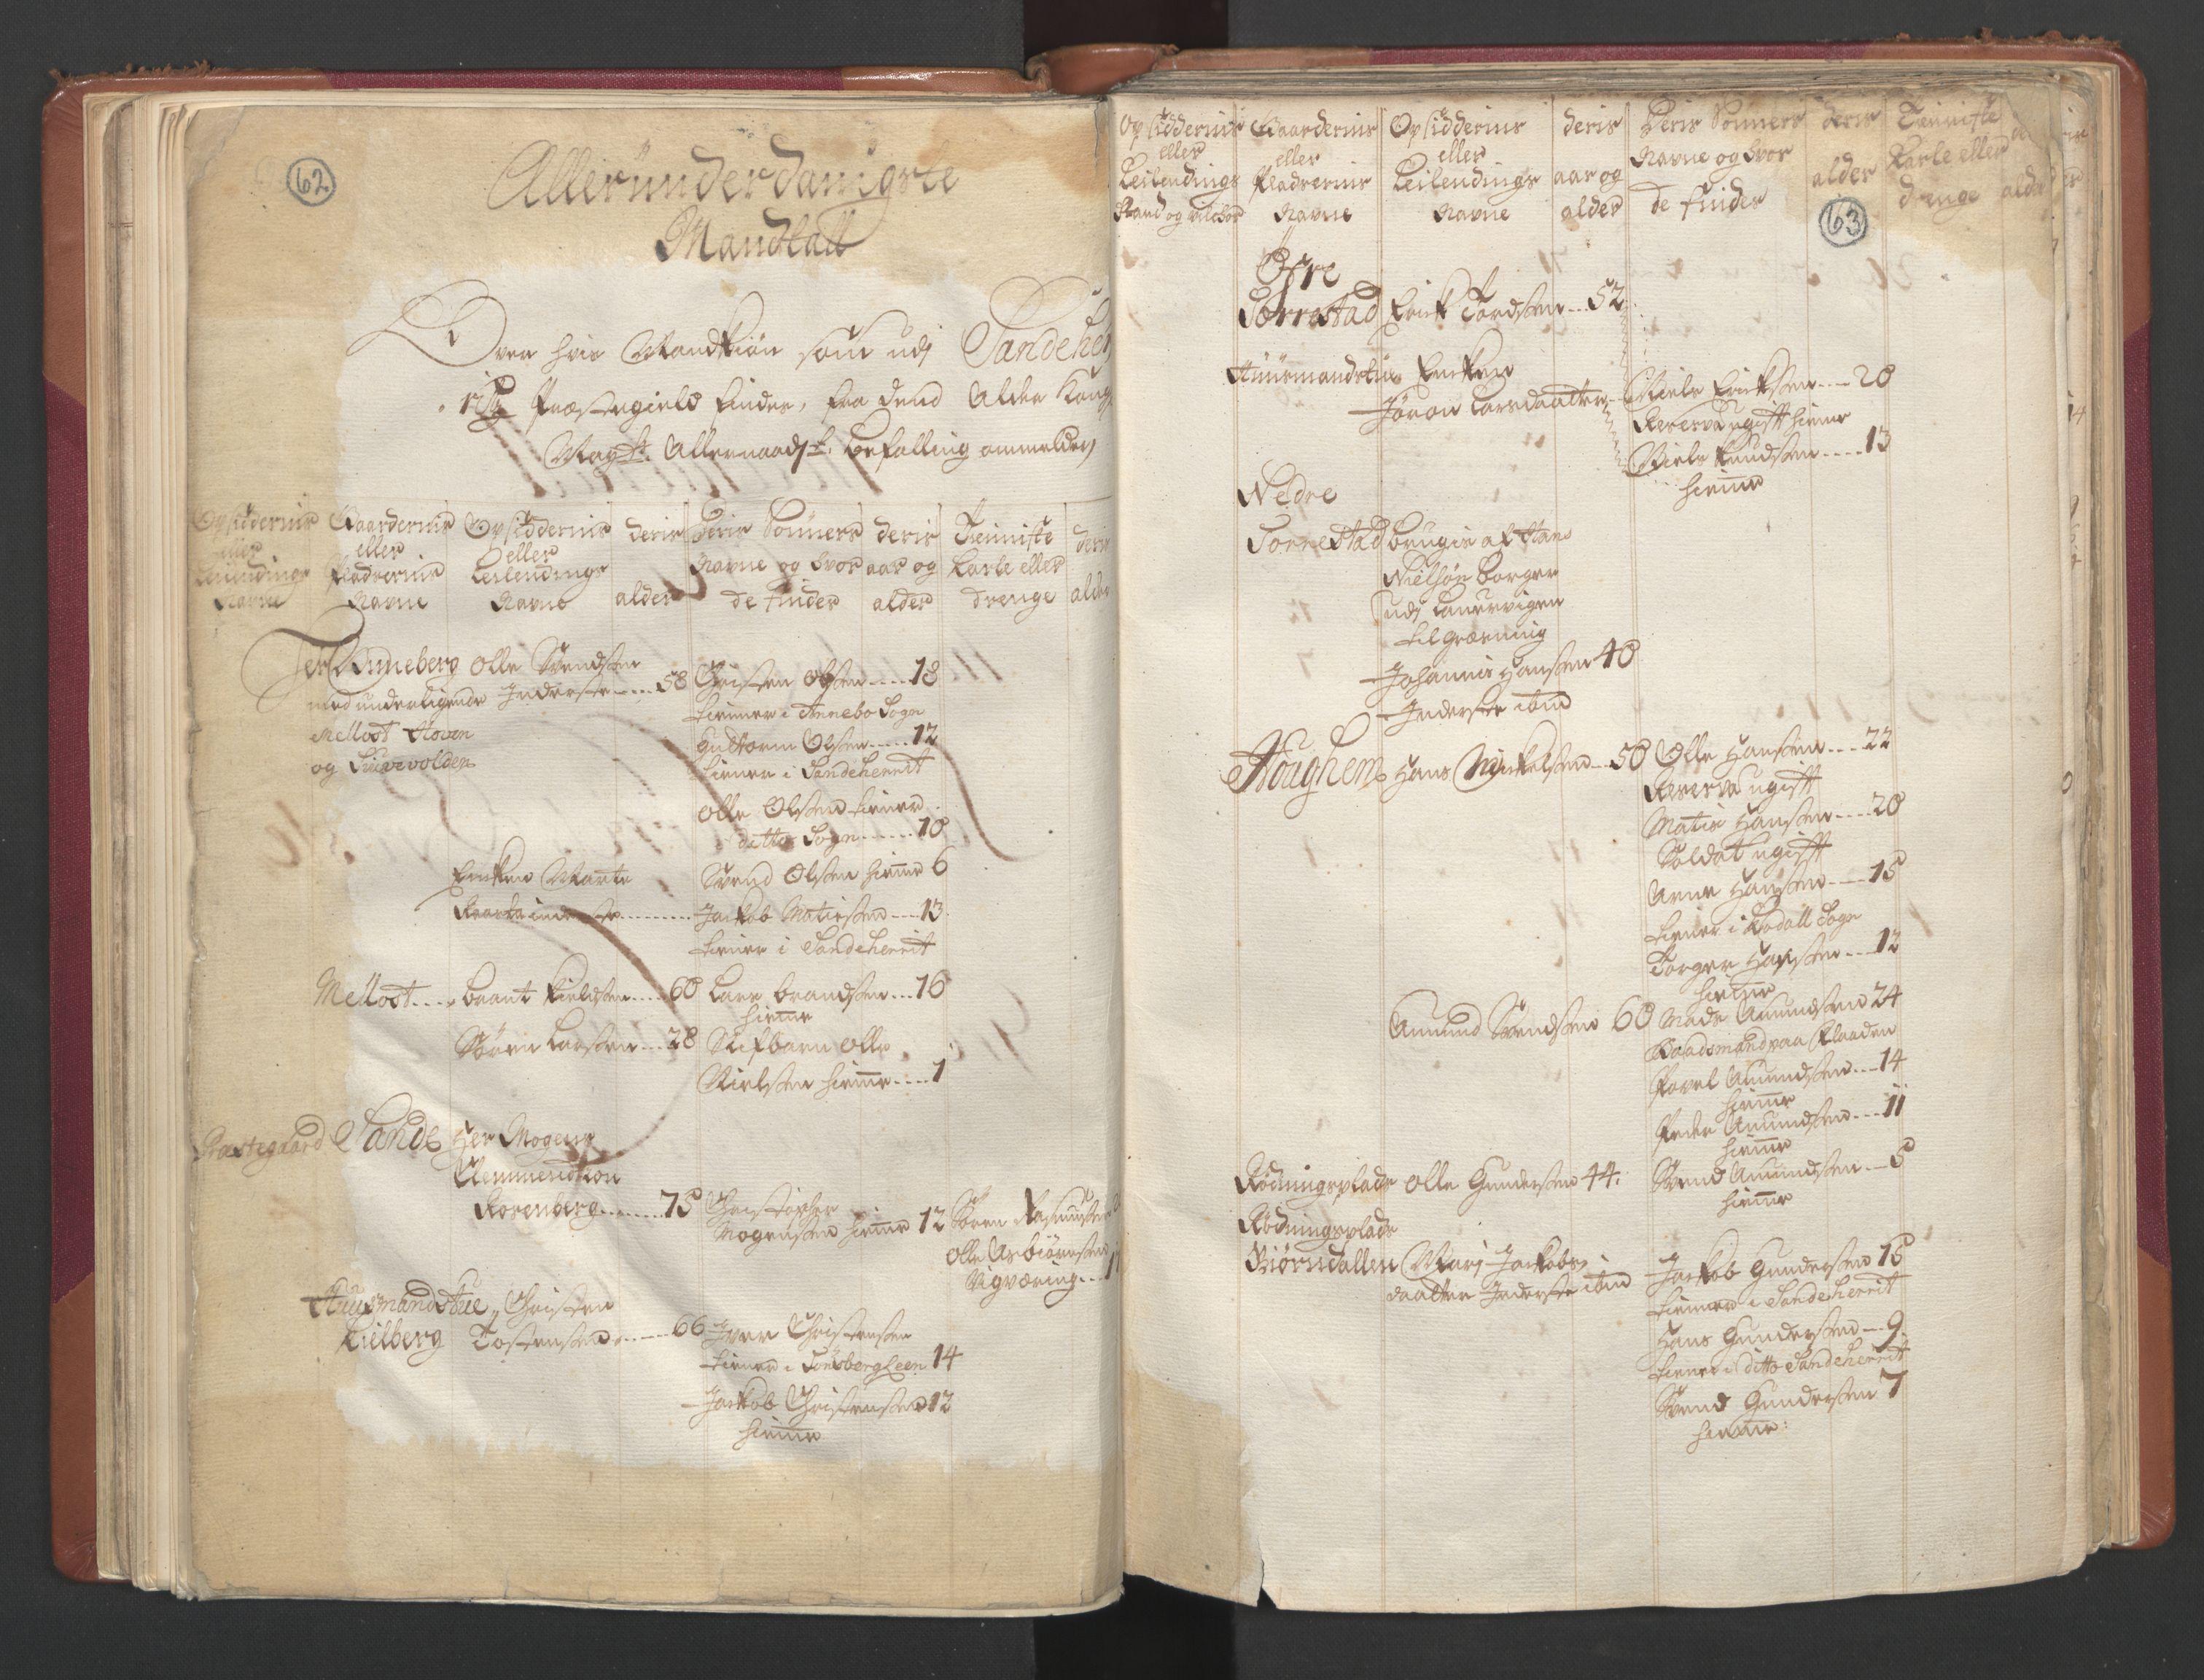 RA, Manntallet 1701, nr. 2: Solør, Odal og Østerdal fogderi og Larvik grevskap, 1701, s. 62-63